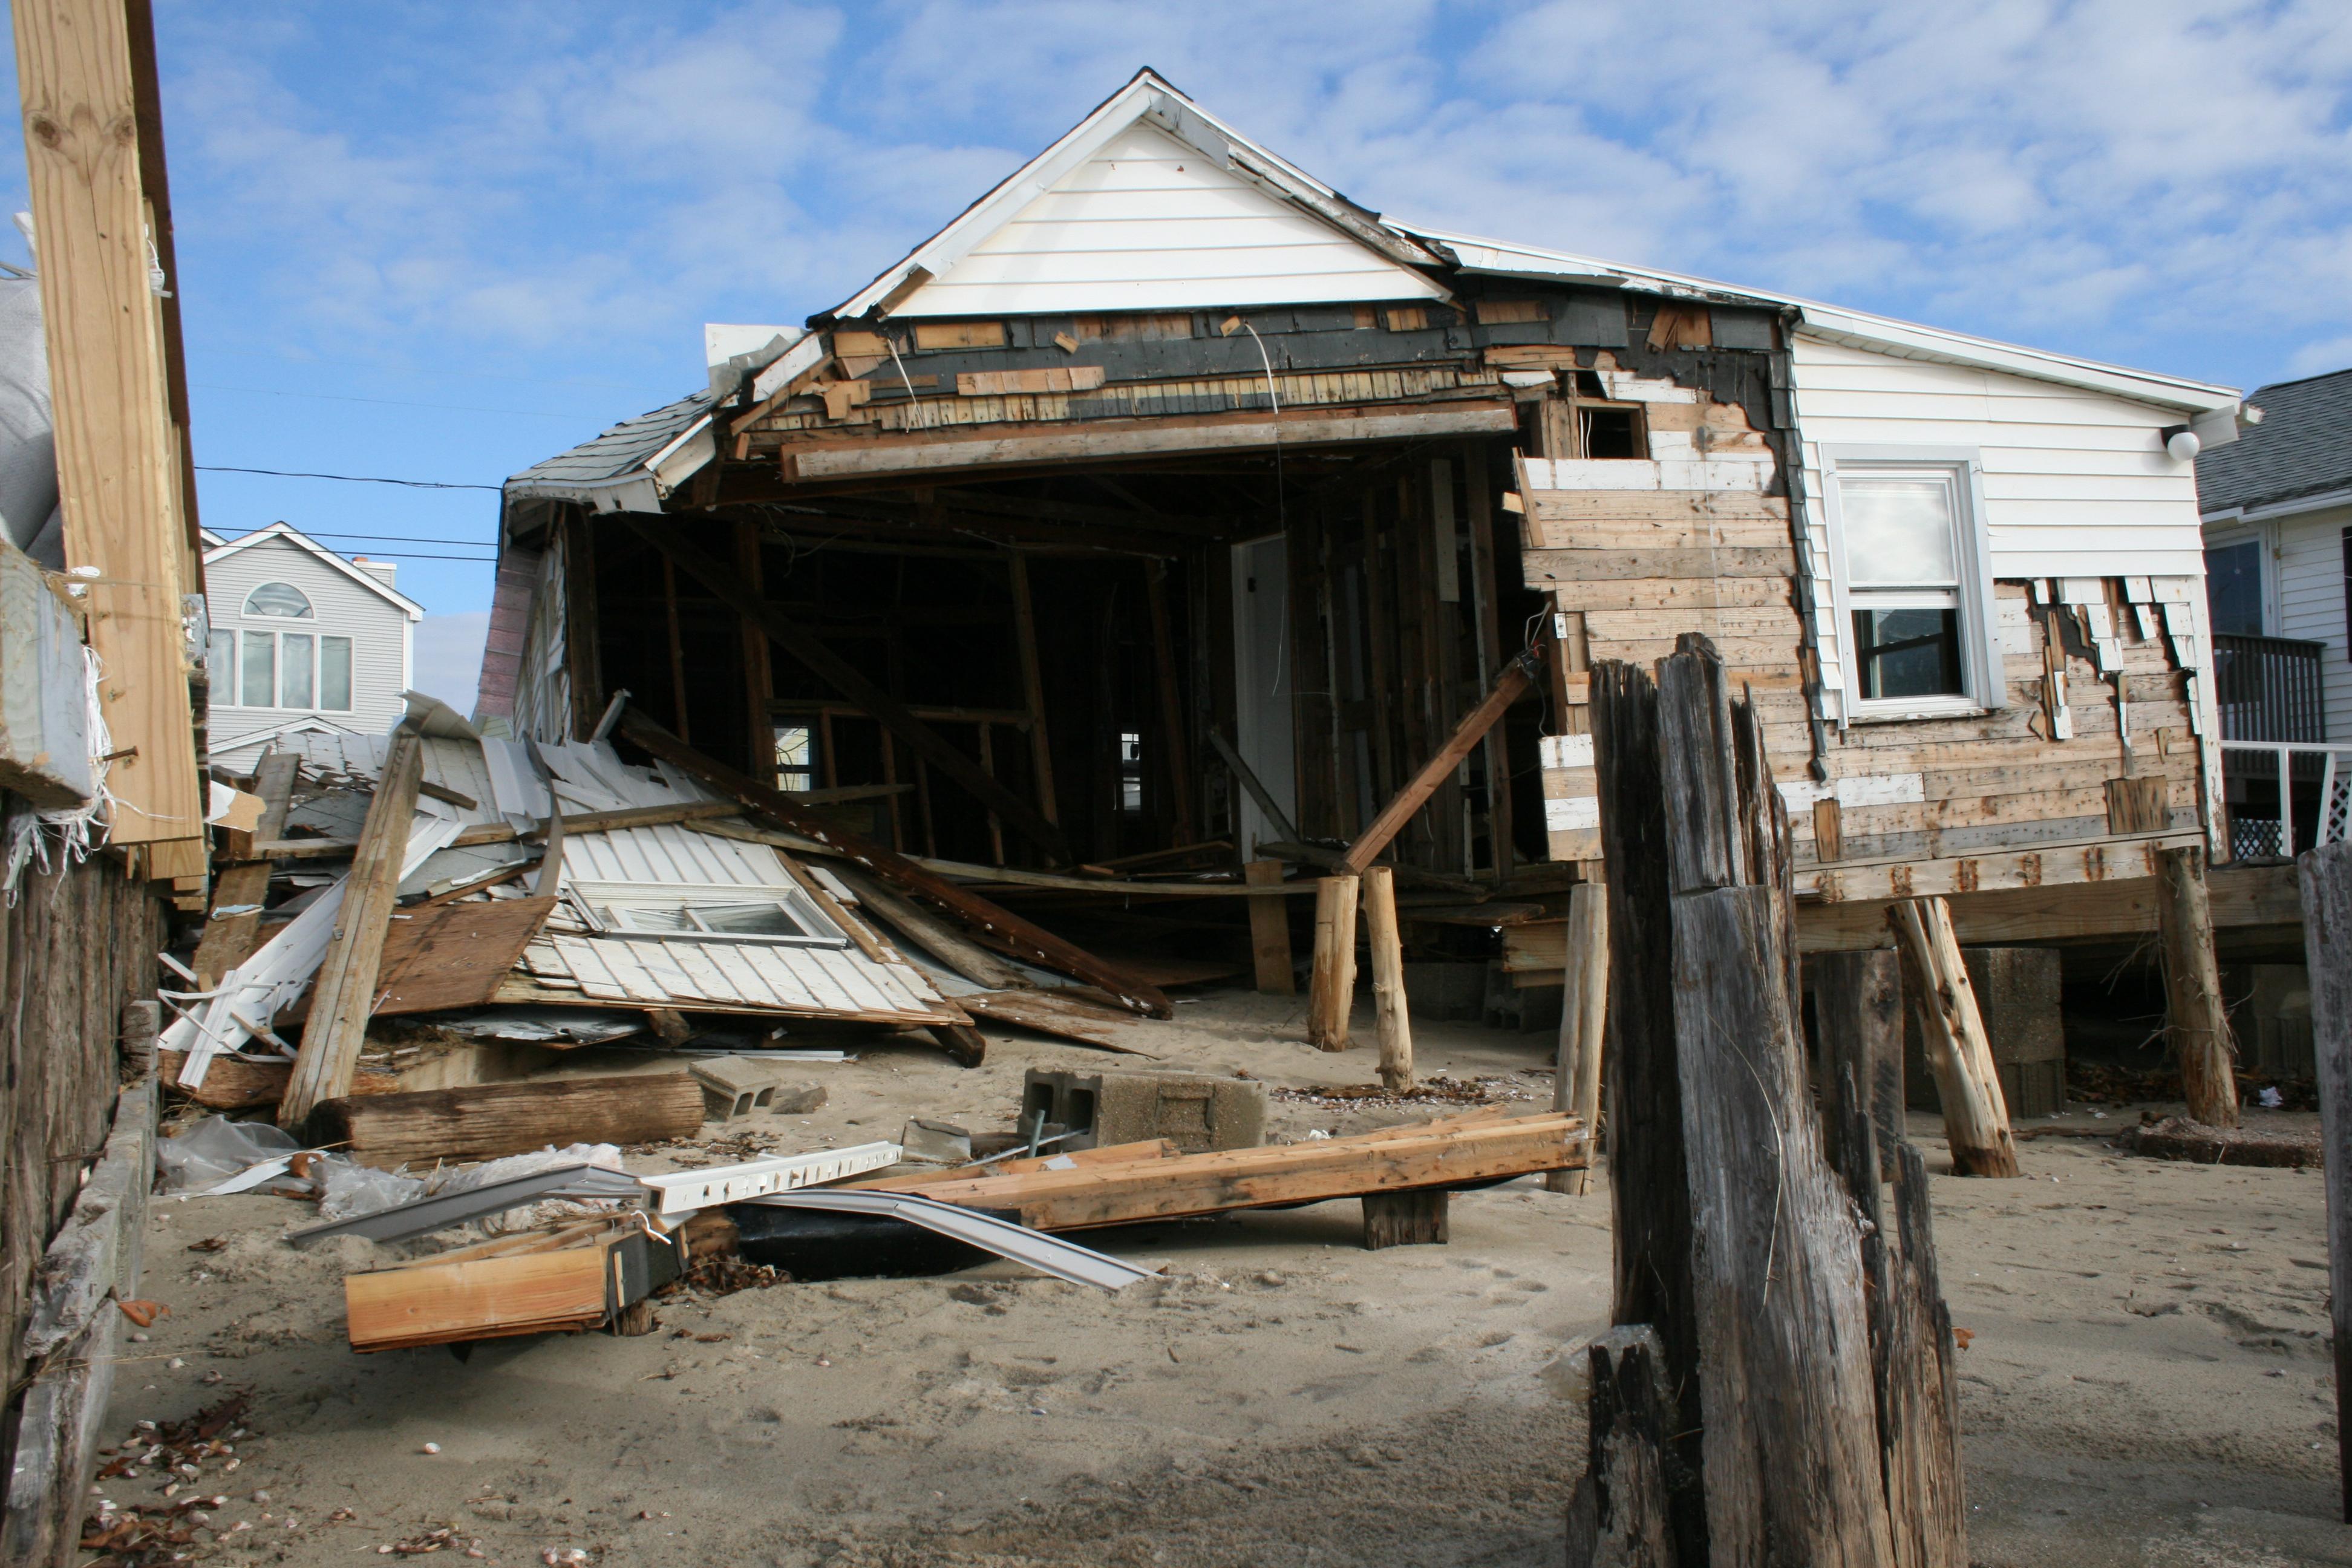 Beachfront cottage leveled by Sandy's storm surge.